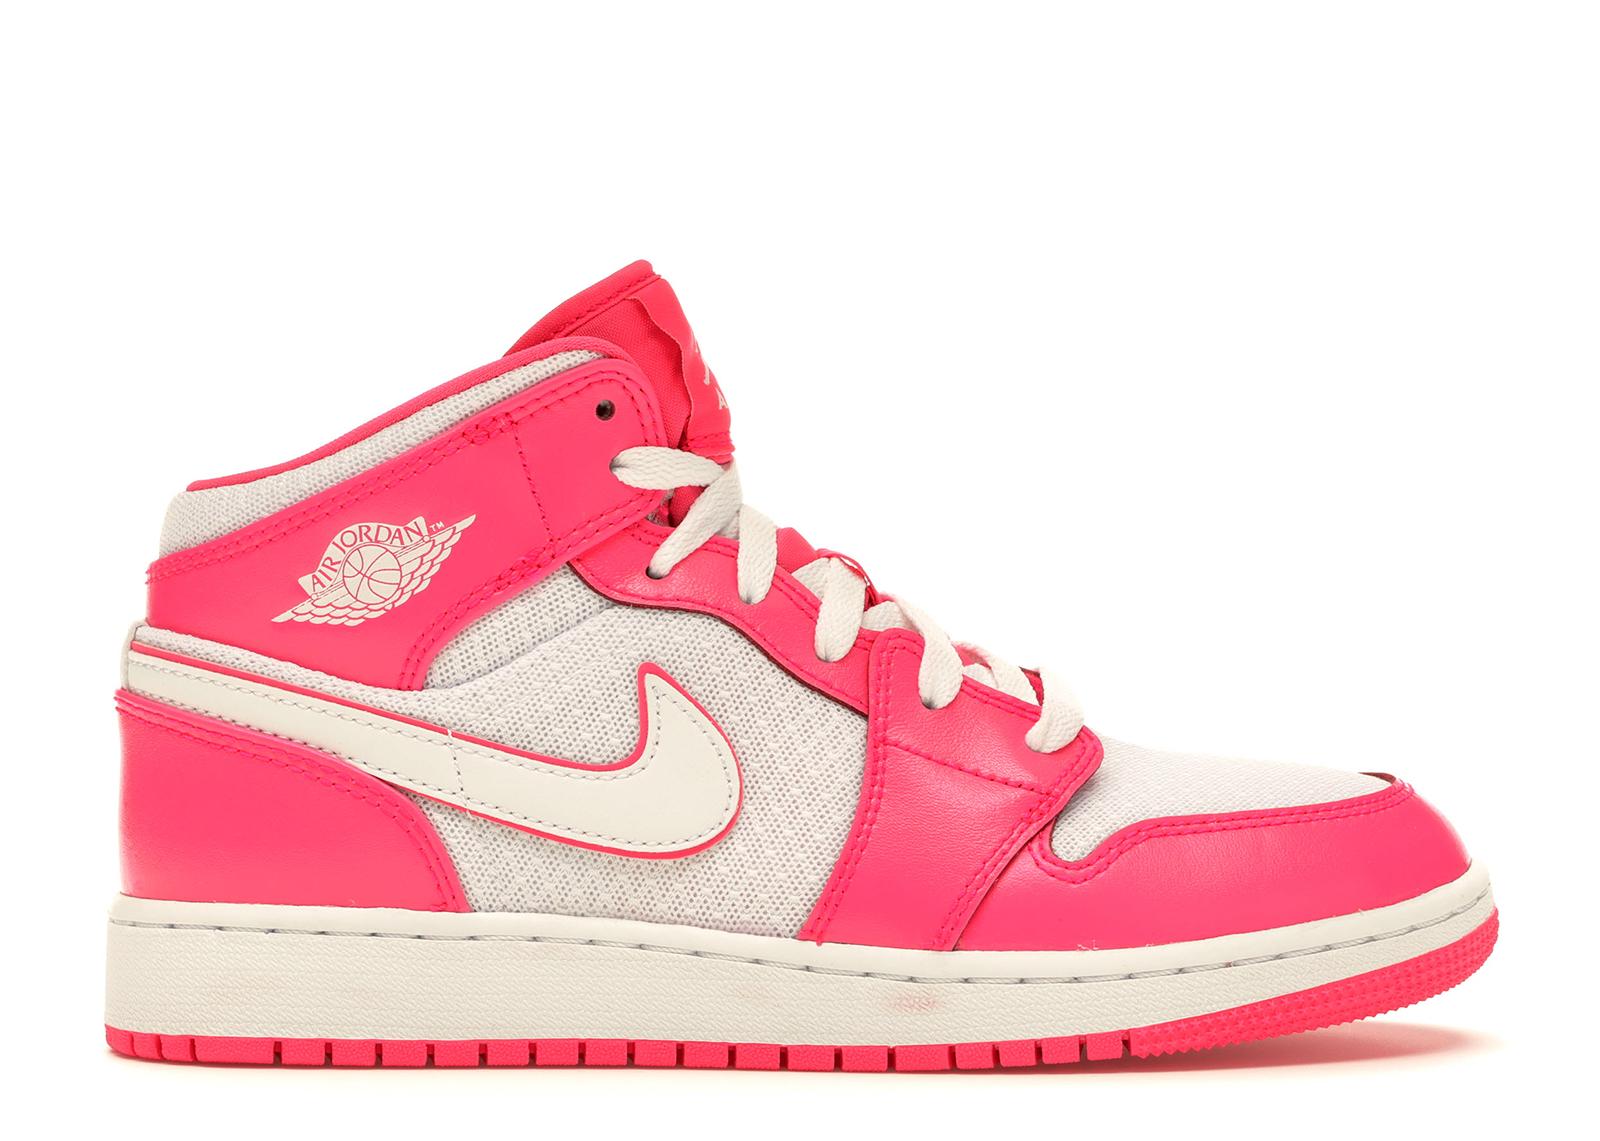 Jordan 1 Mid Hyper Pink White (GS